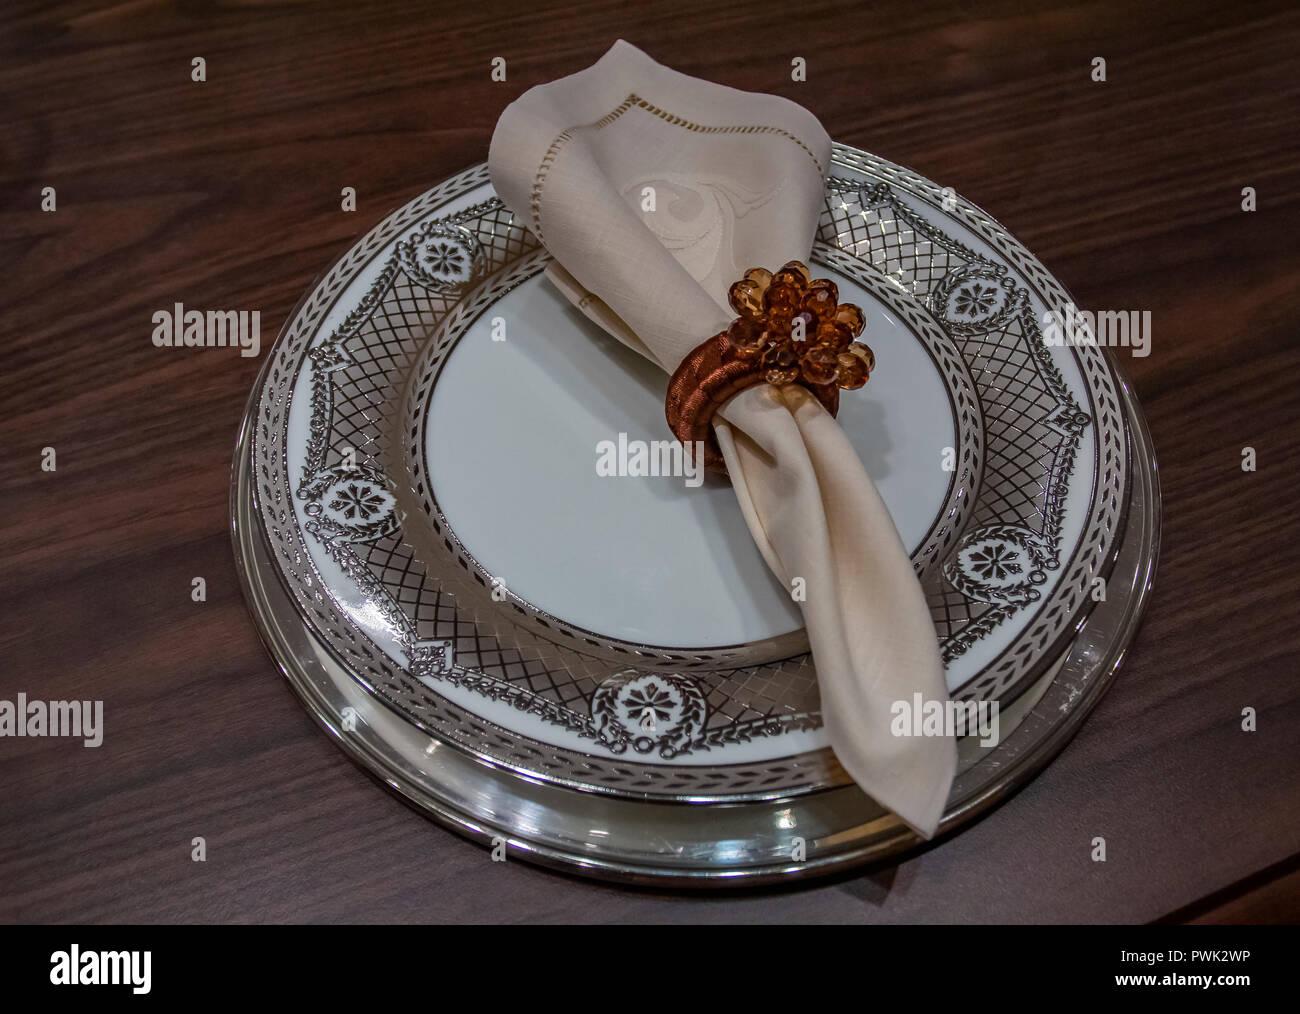 Empty plate with a napkin. Luxury wedding reception in restaurant. stylish decor and adorning. Stylish Napkin - Stock Image